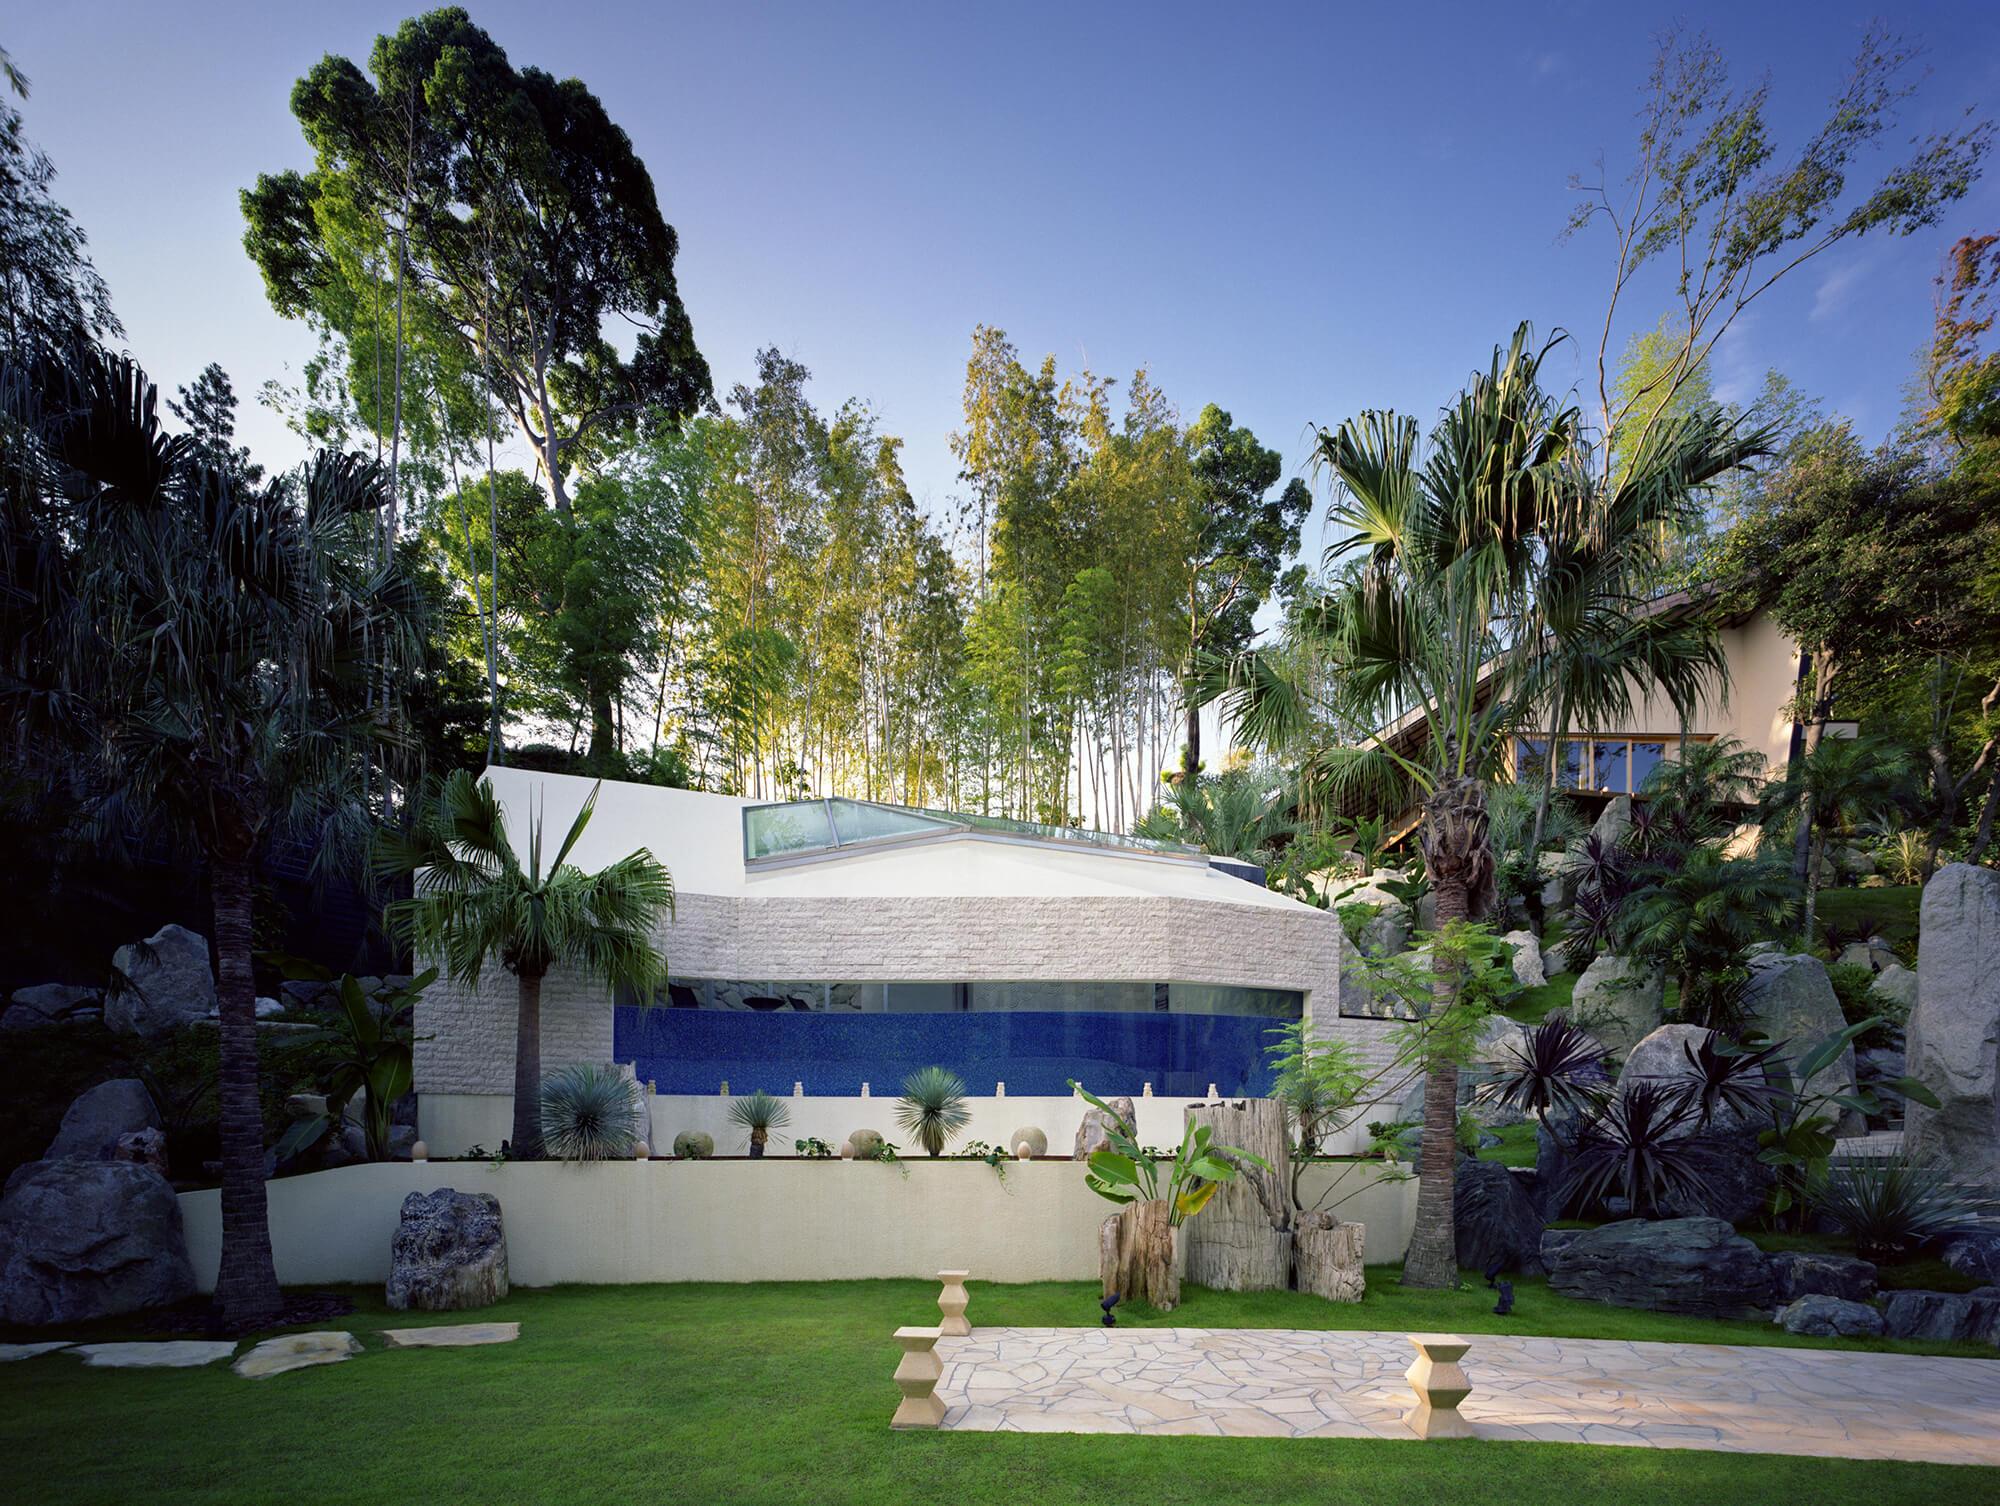 『桜坂の家』-福岡県福岡市-建築写真・竣工写真・インテリア写真5